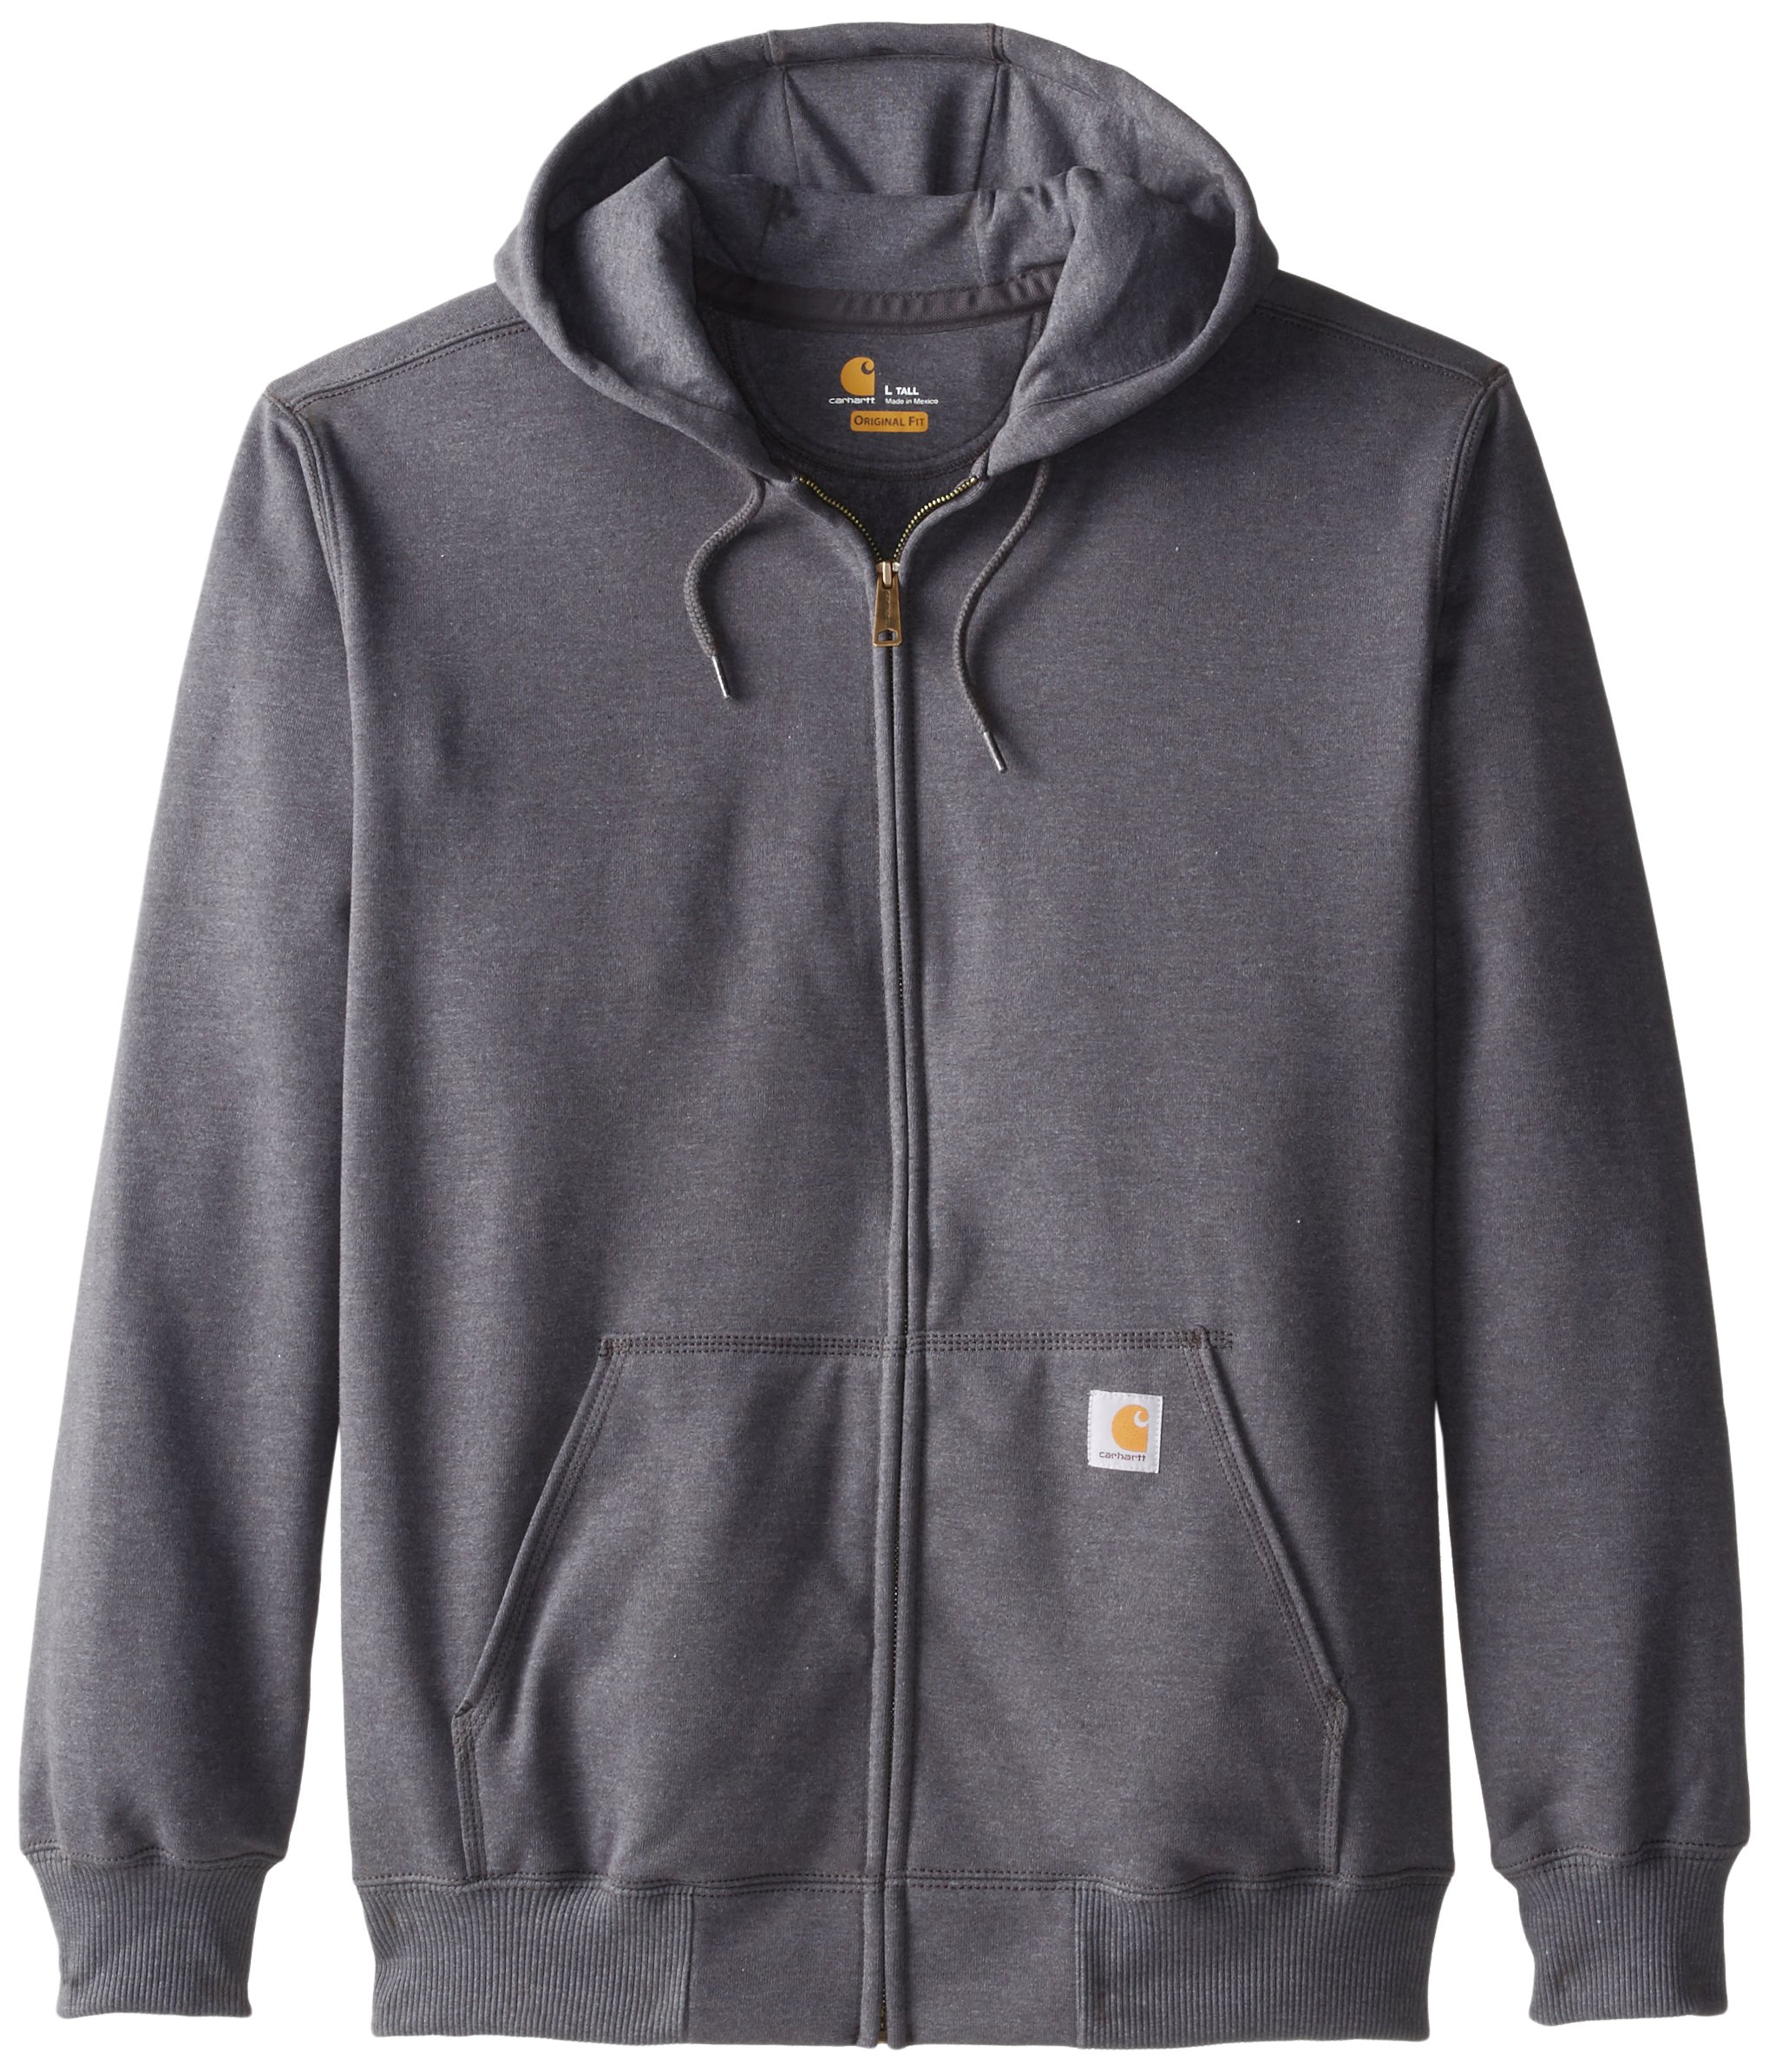 Carhartt Men's Big & Tall Rain Defender Paxton Heavyweight Hooded Zip Front Sweatshirt,Carbon Heather,Large Tall